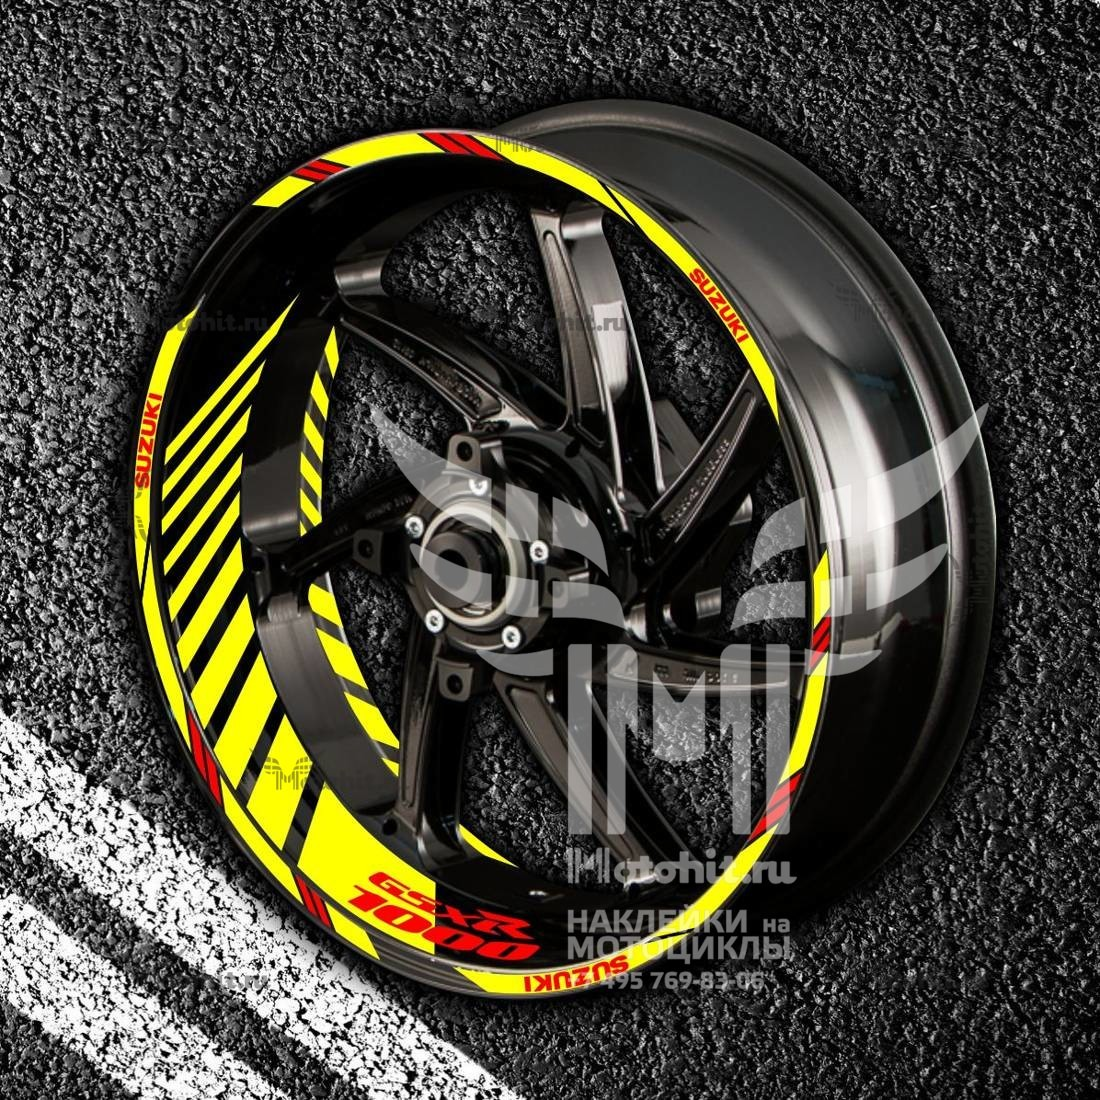 Комплект наклеек с полосами на колеса мотоцикла SUZUKI GSX-1000-R